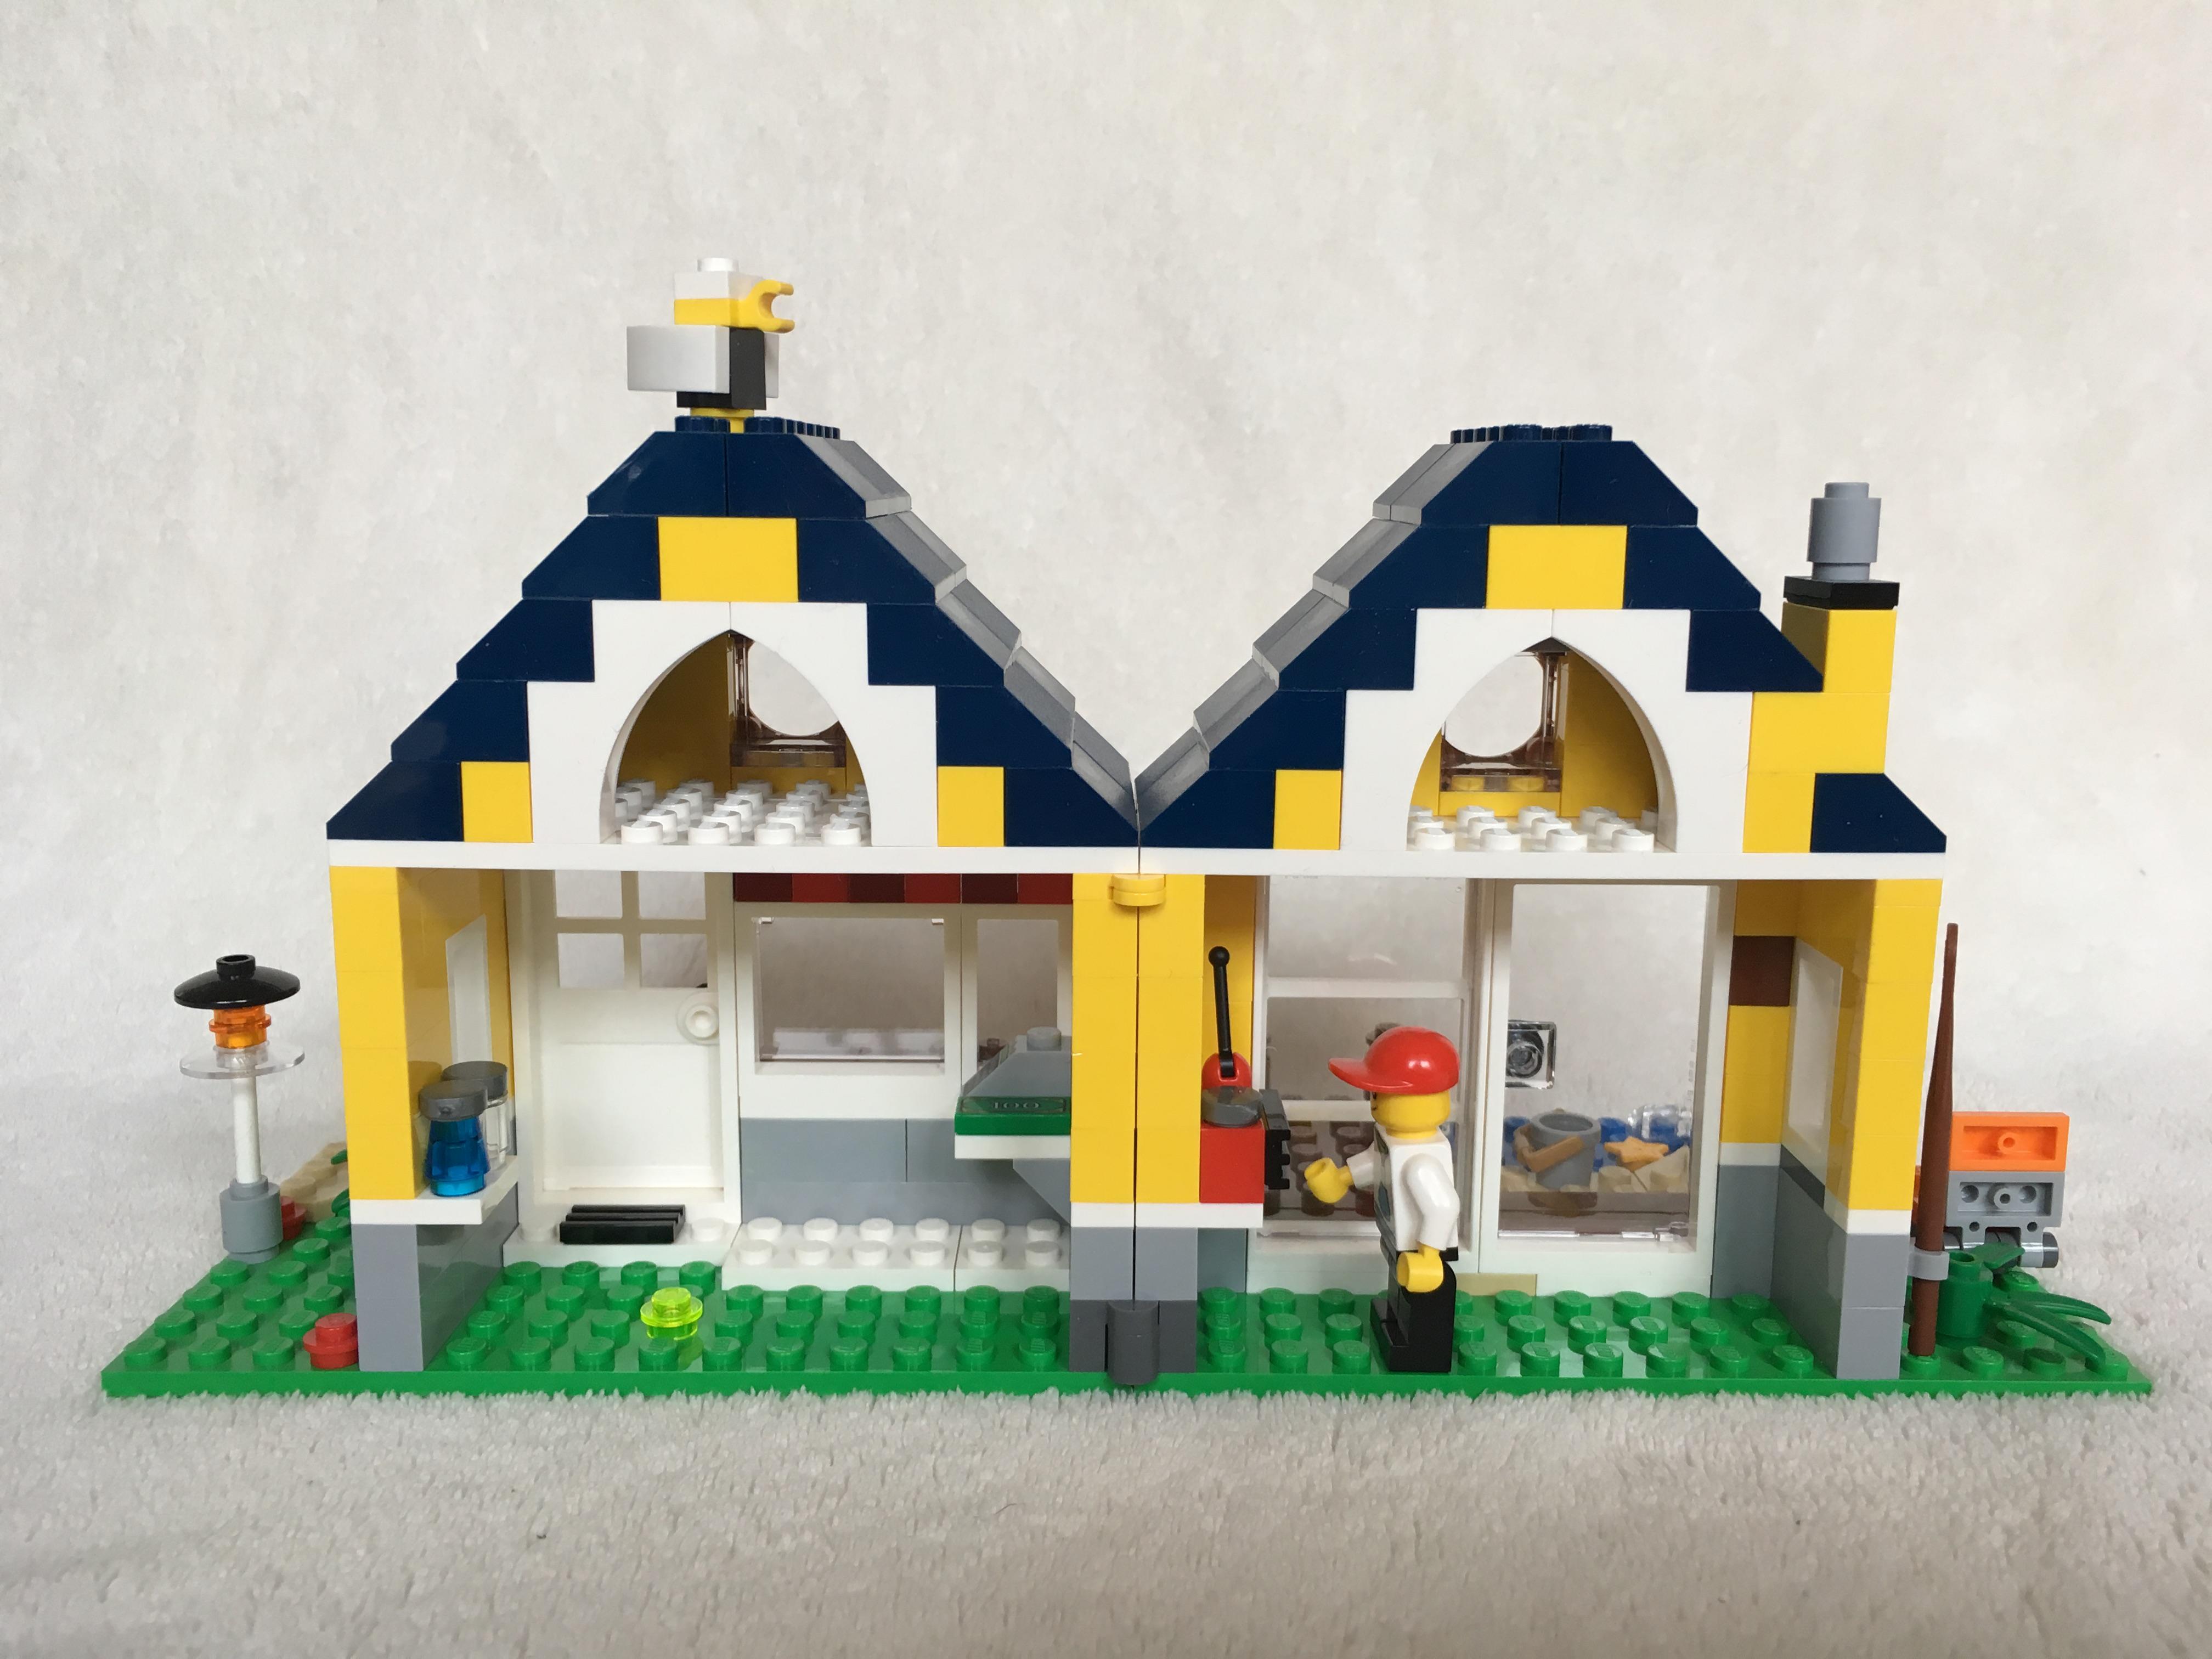 Lego 31035 – Beach Hut – Brick Geek